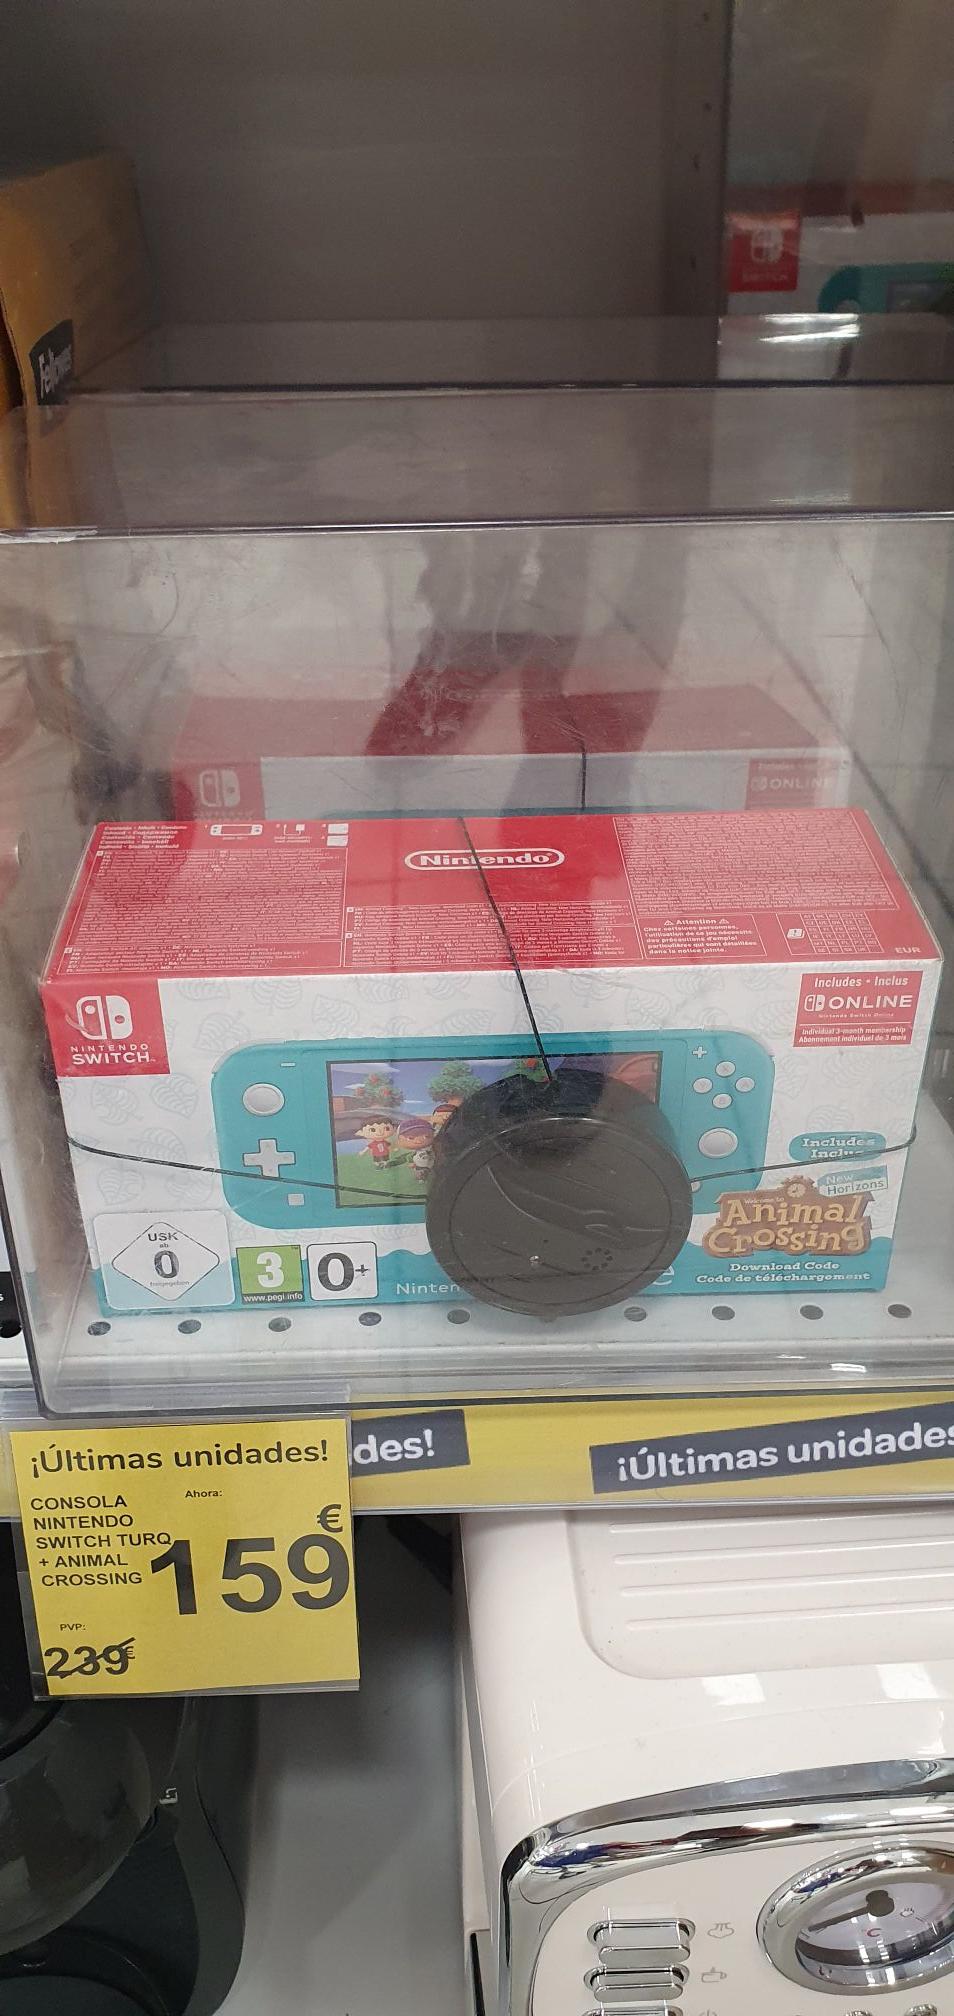 Nintendo Switch Lite + Animal Crossing + 3 meses Online en Carrefour Sa Coma (Mallorca)